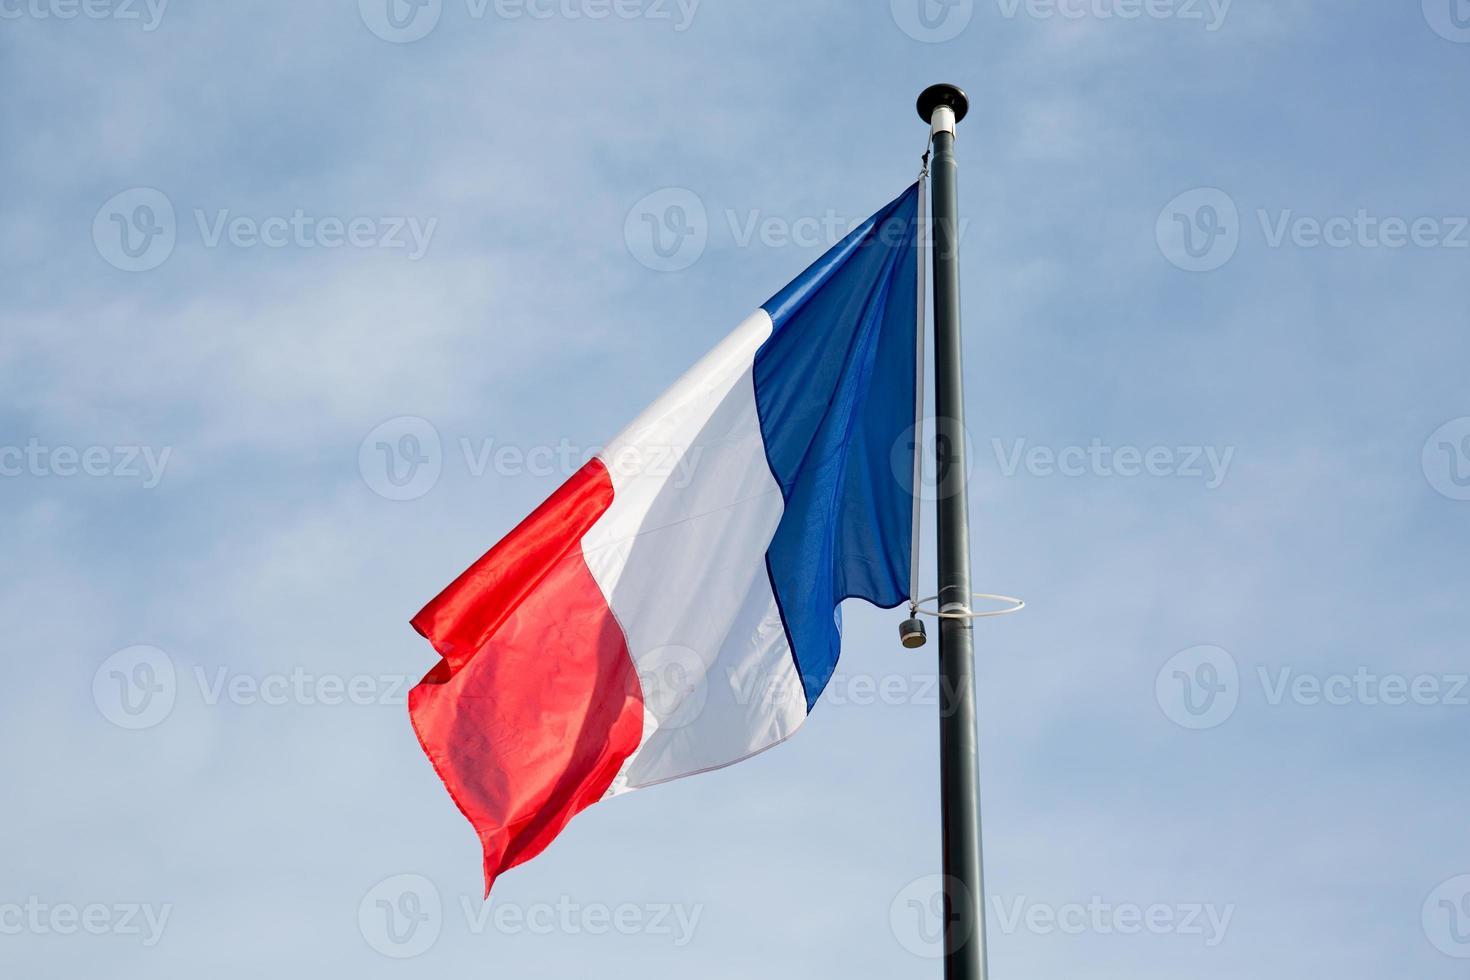 Franse vlag onder blauwe hemel foto